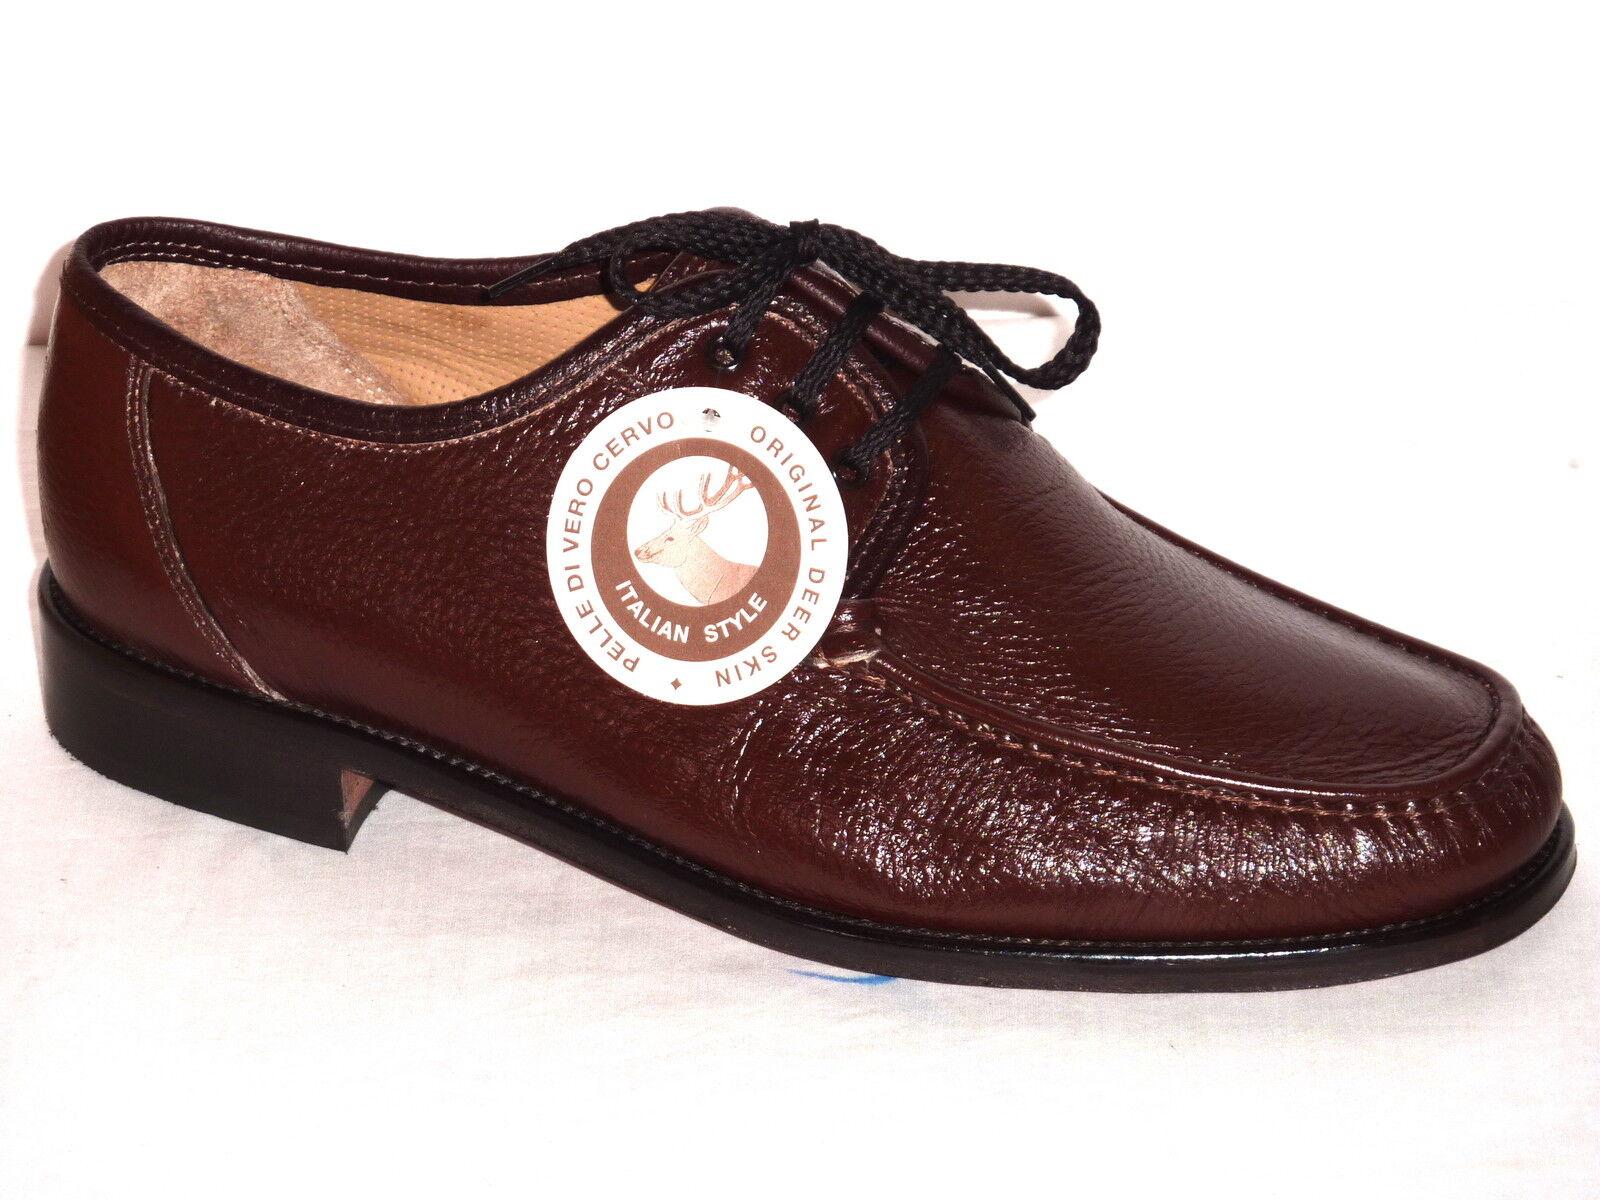 U4201h melluso zapatos Man fasten Skin Deer marrón Fashion Comfortable No 43